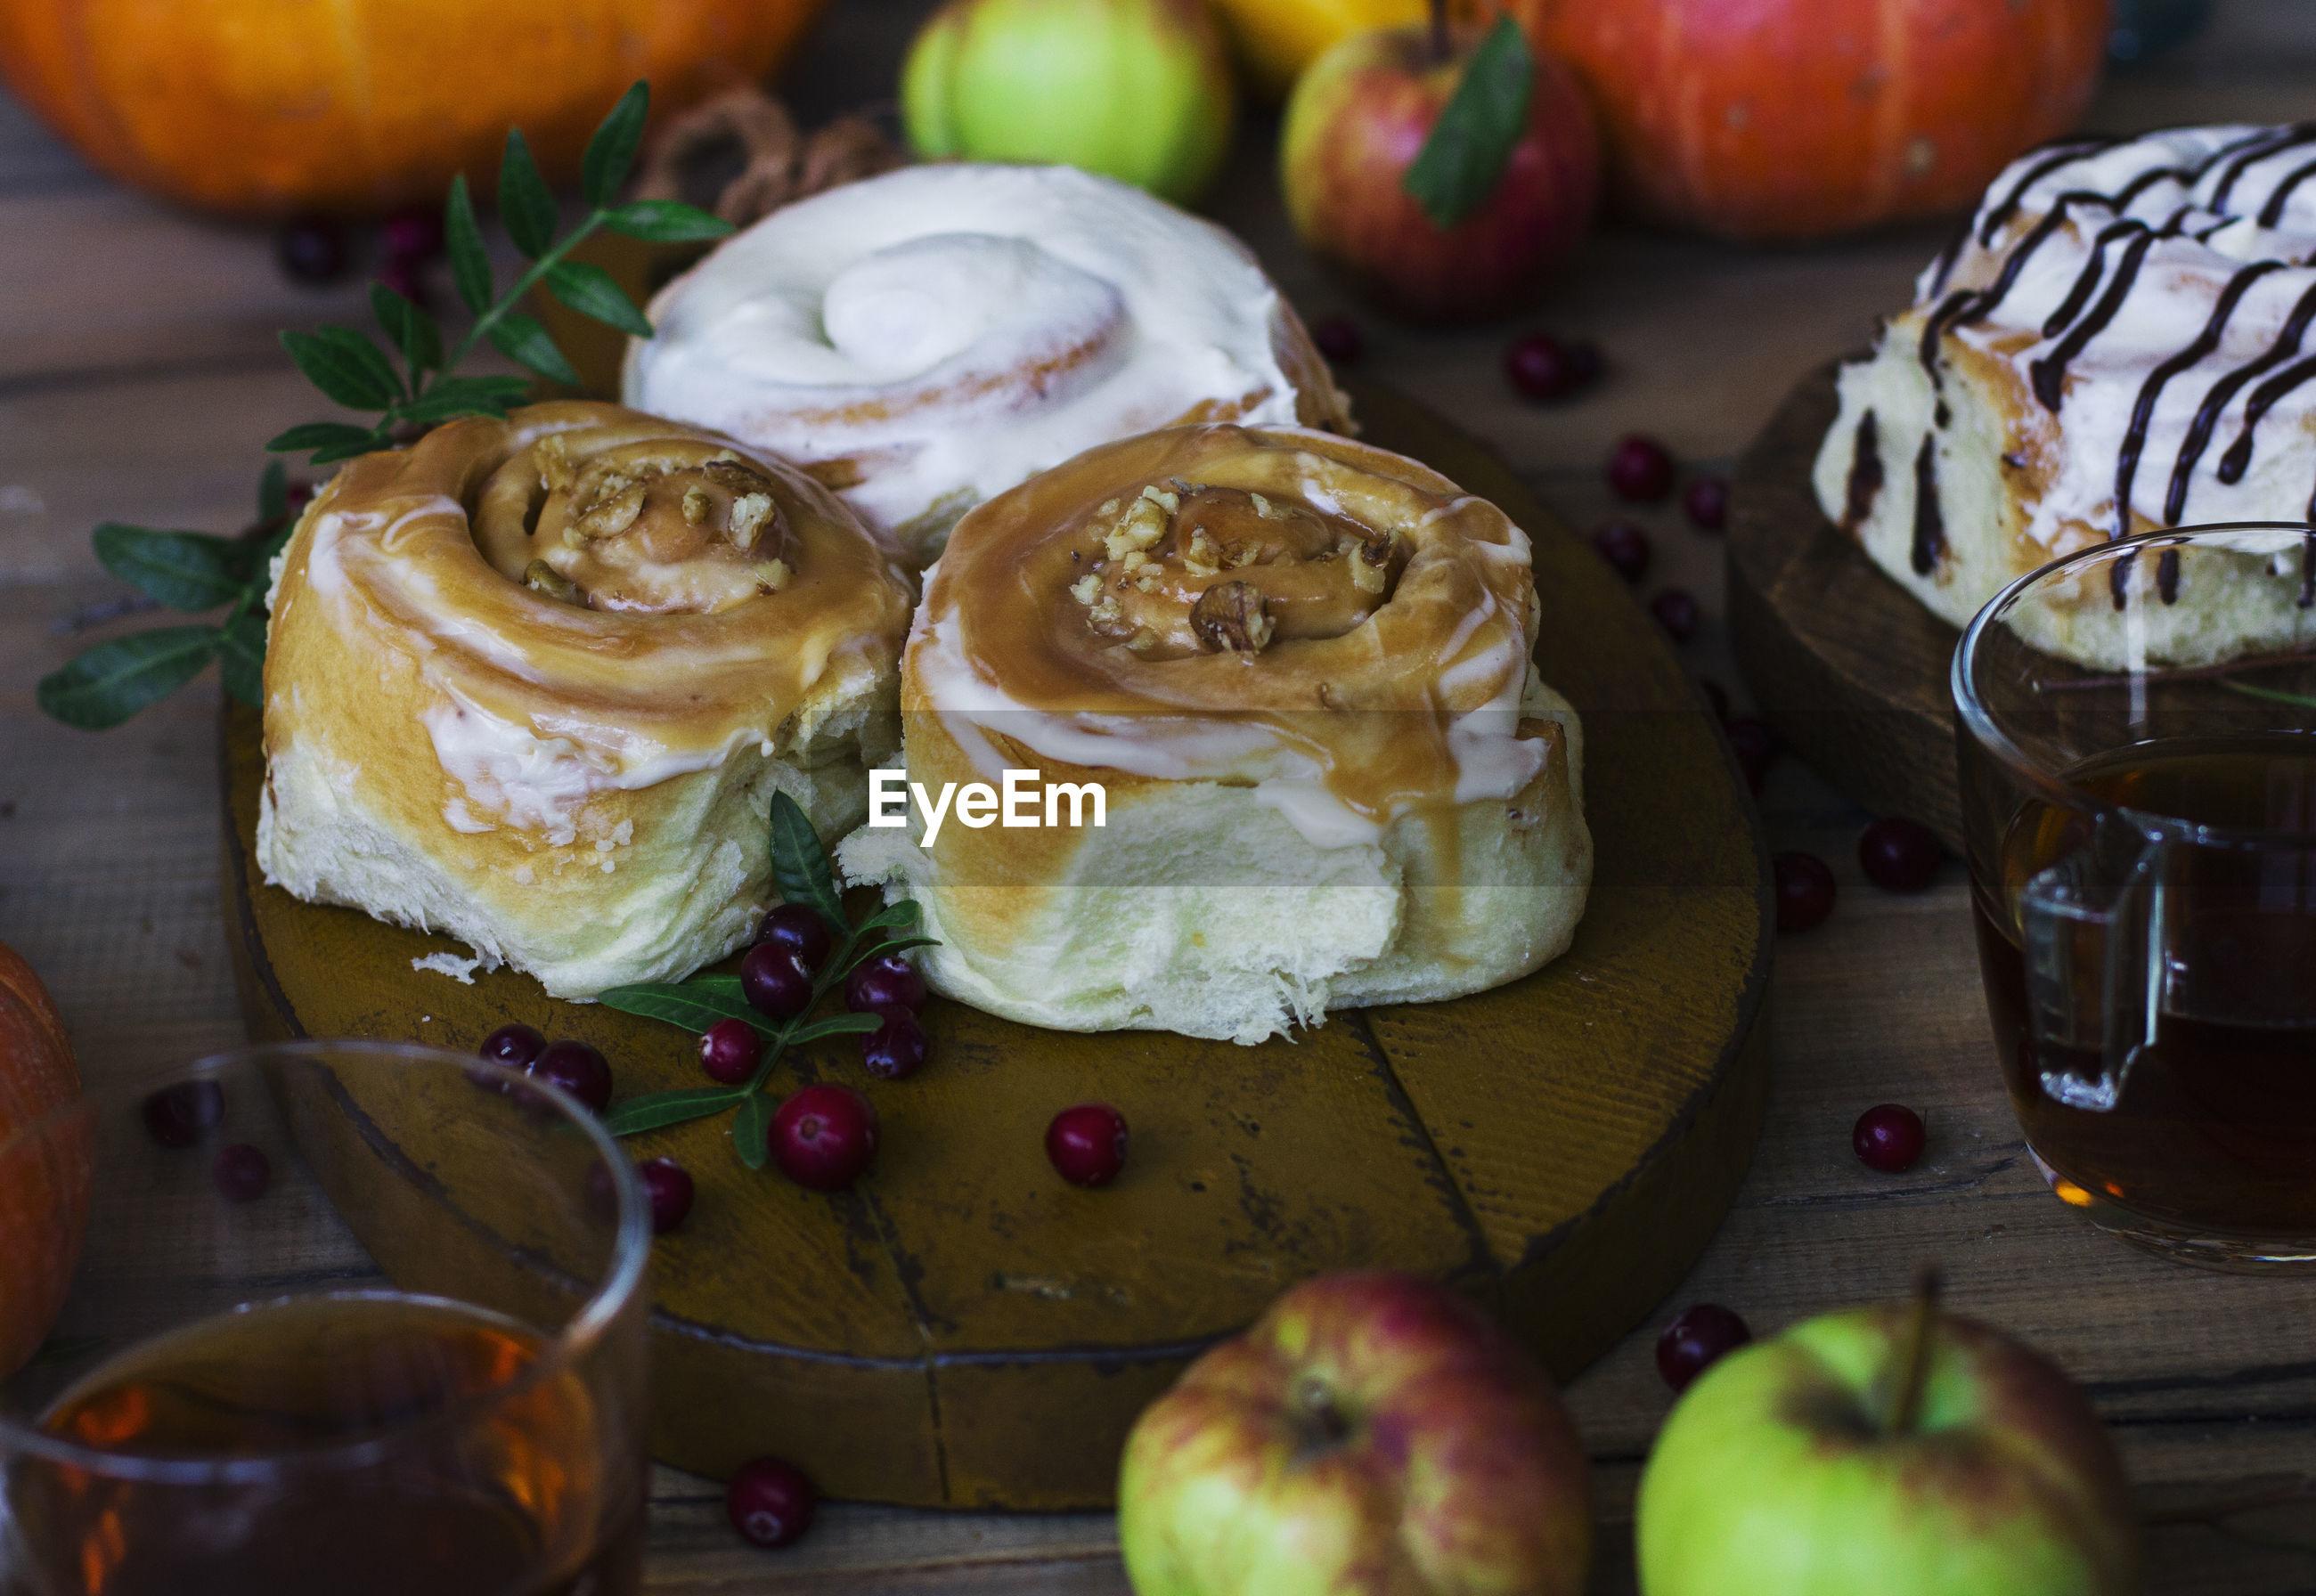 Cinnamon bun and apples with coffee on table